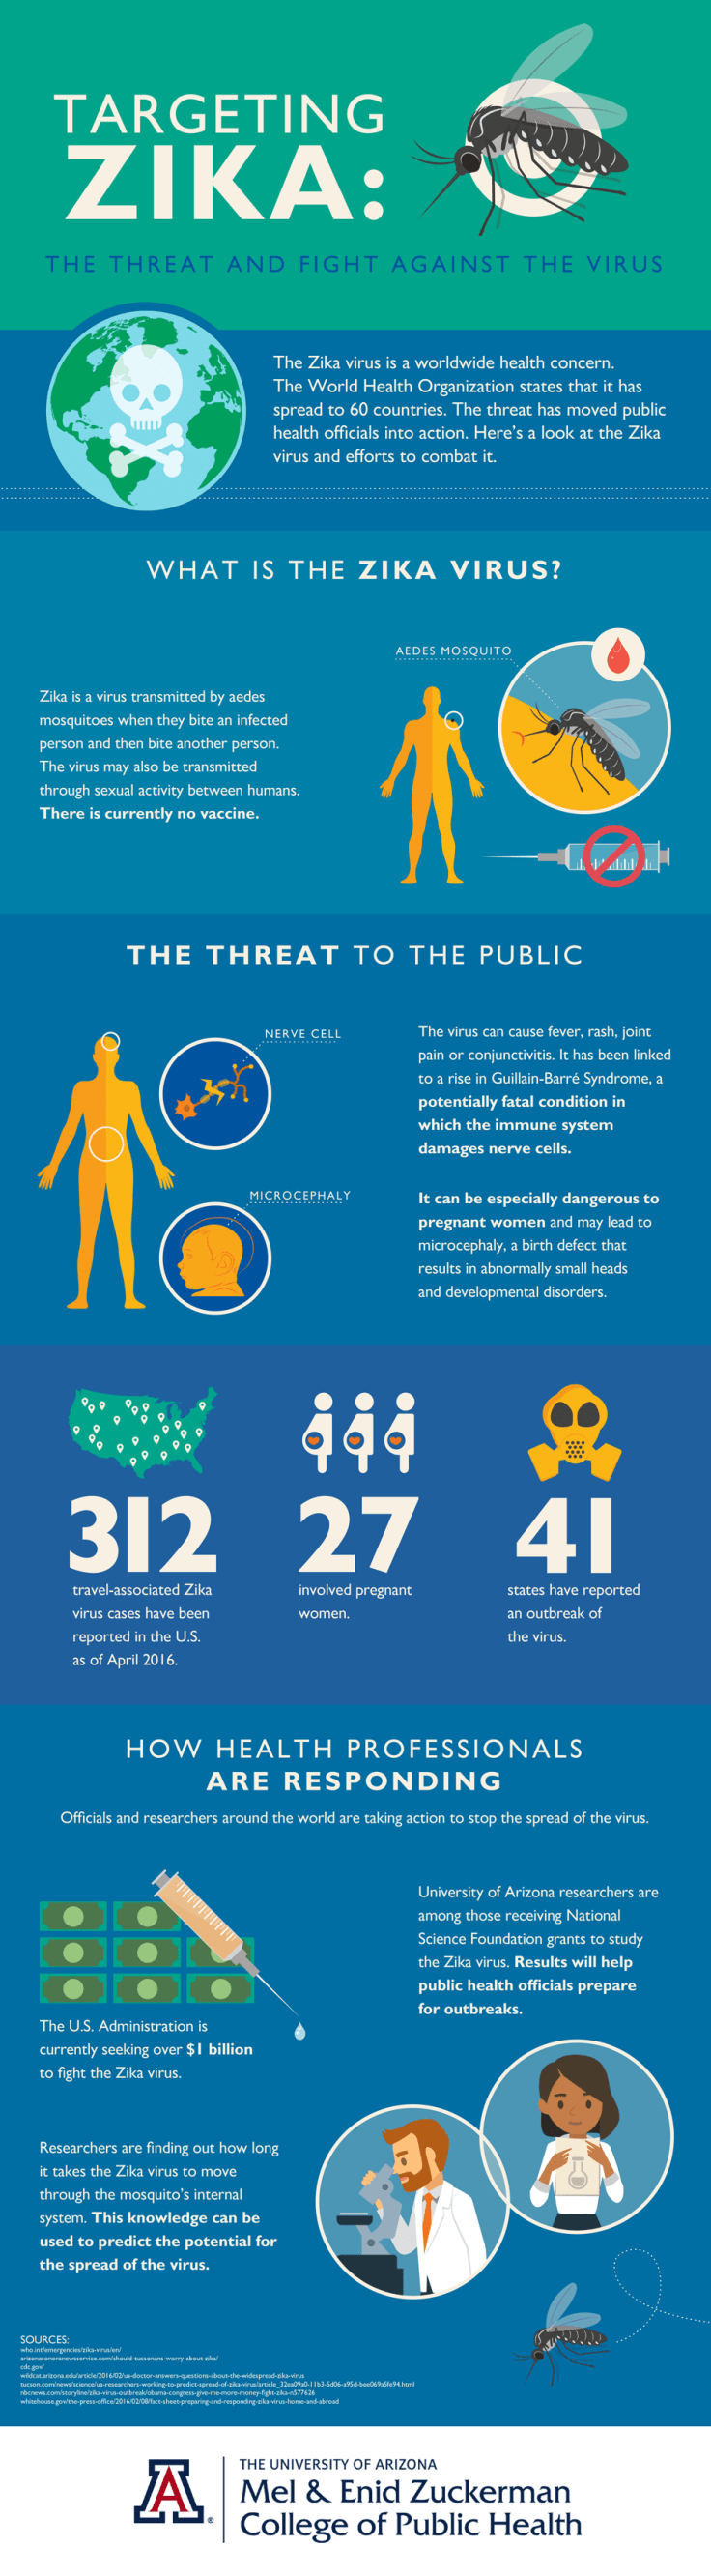 The Fight Against Zika Virus Infographic